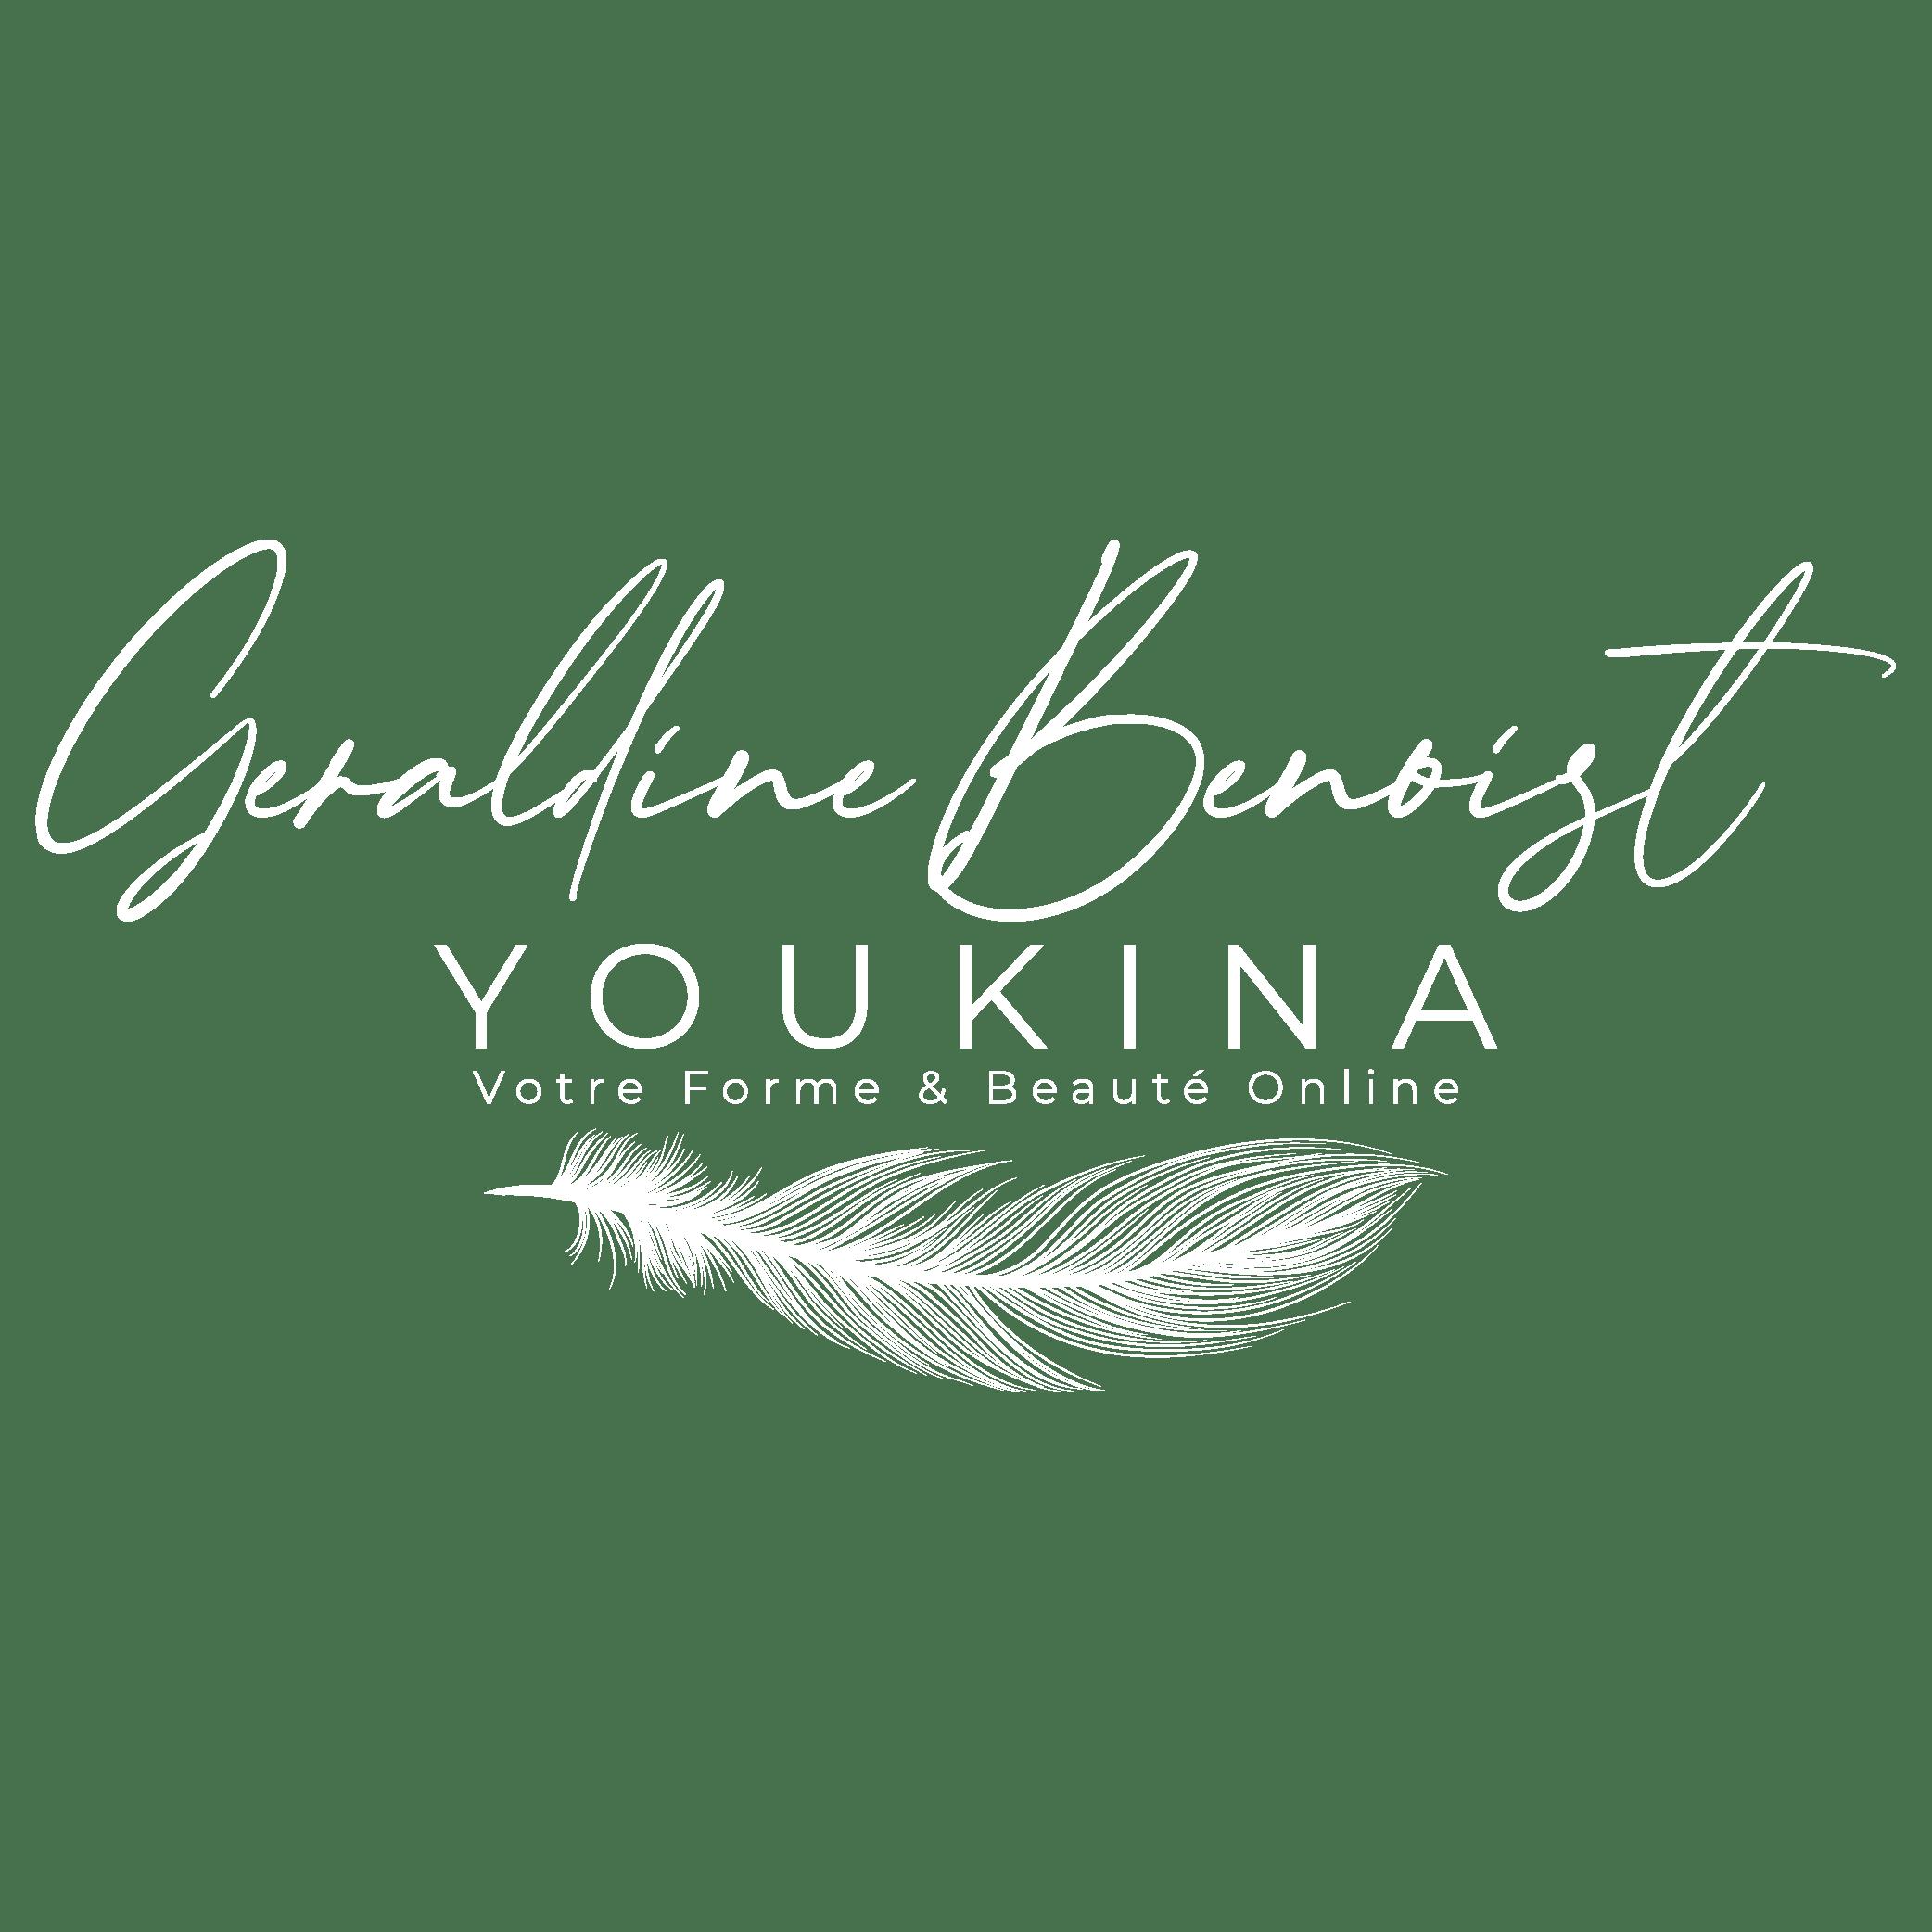 Logo Youkina Geraldinebenoist New03 Blanc